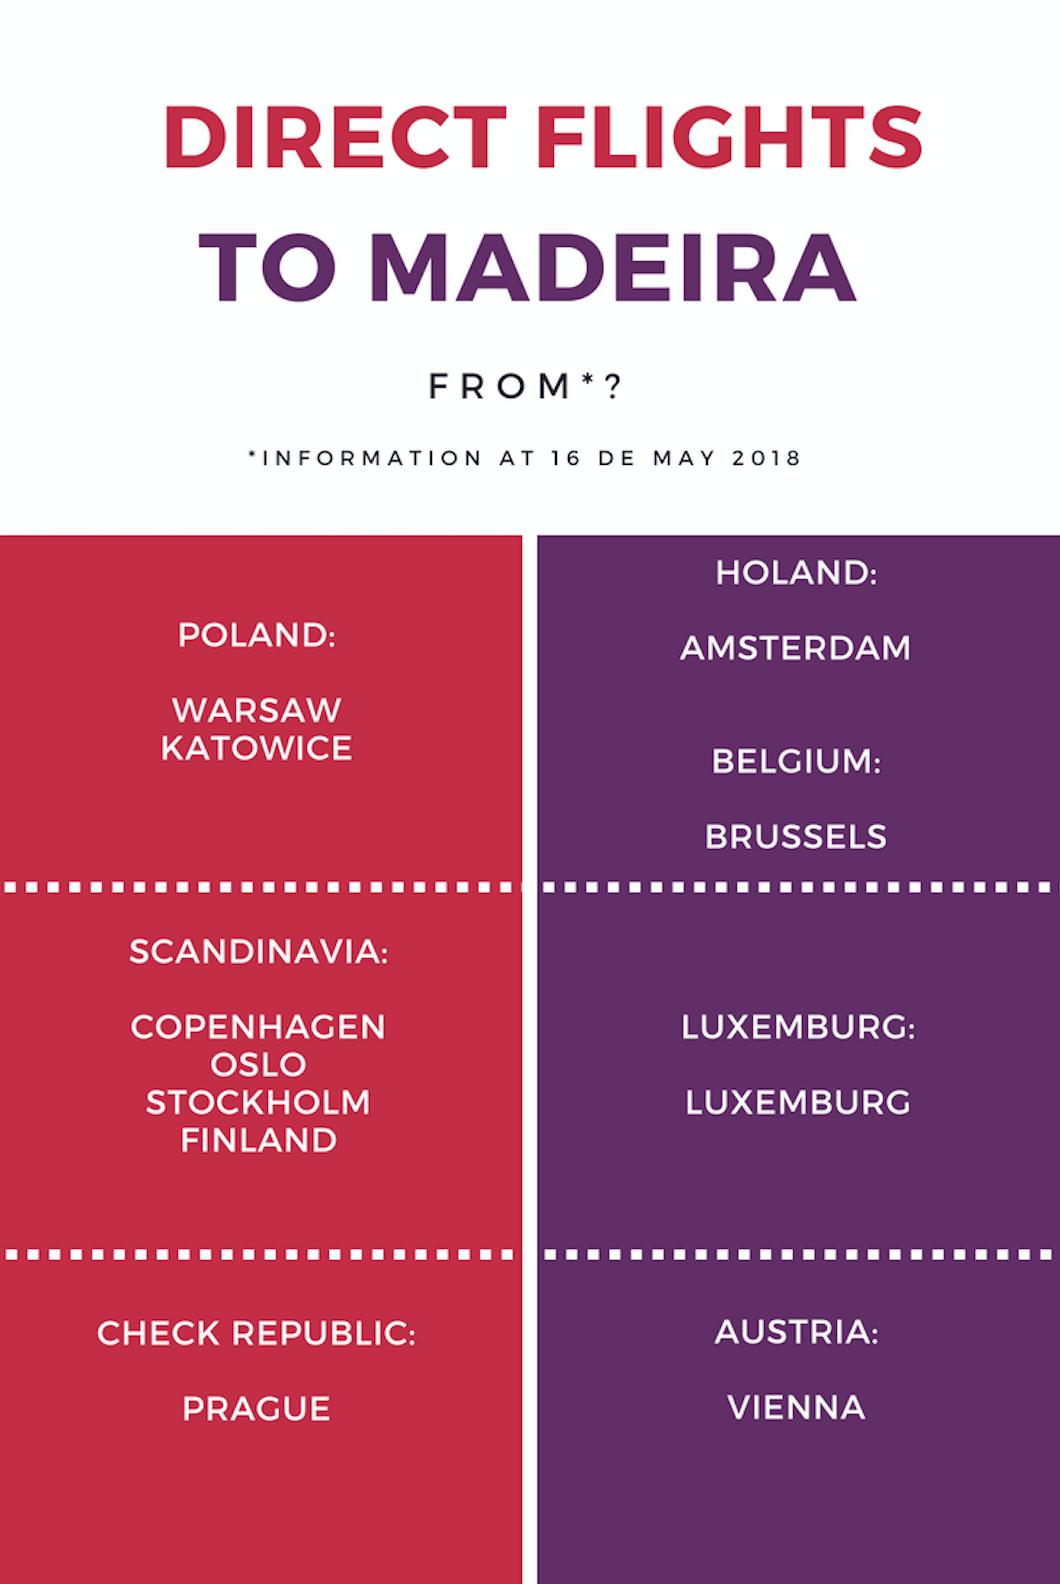 DIRECT FLIGHTS MADEIRA